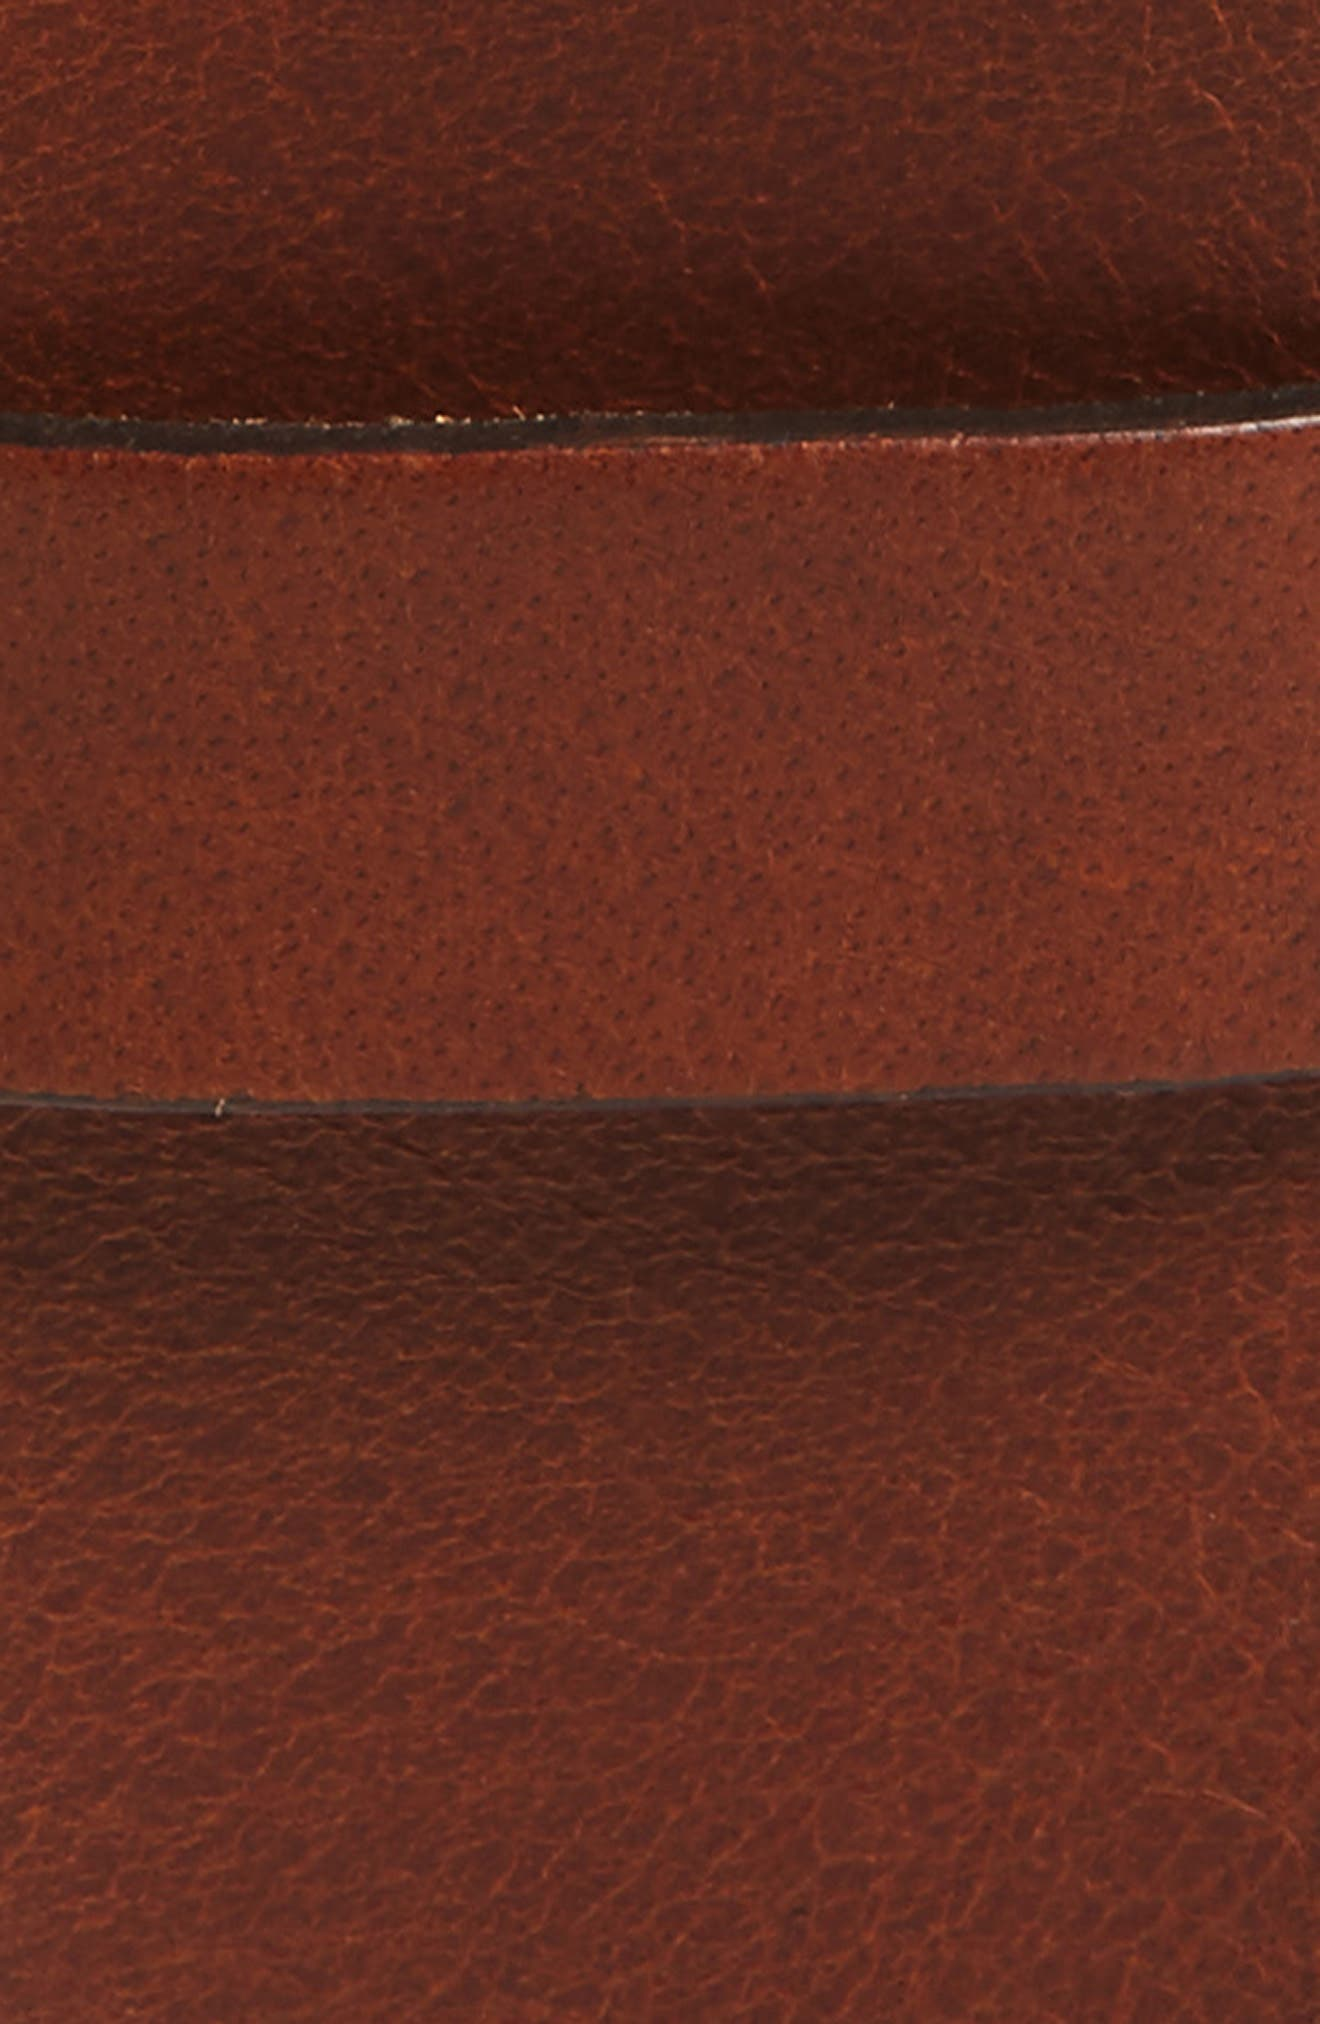 Roller Buckle Leather Belt,                             Alternate thumbnail 2, color,                             Cognac